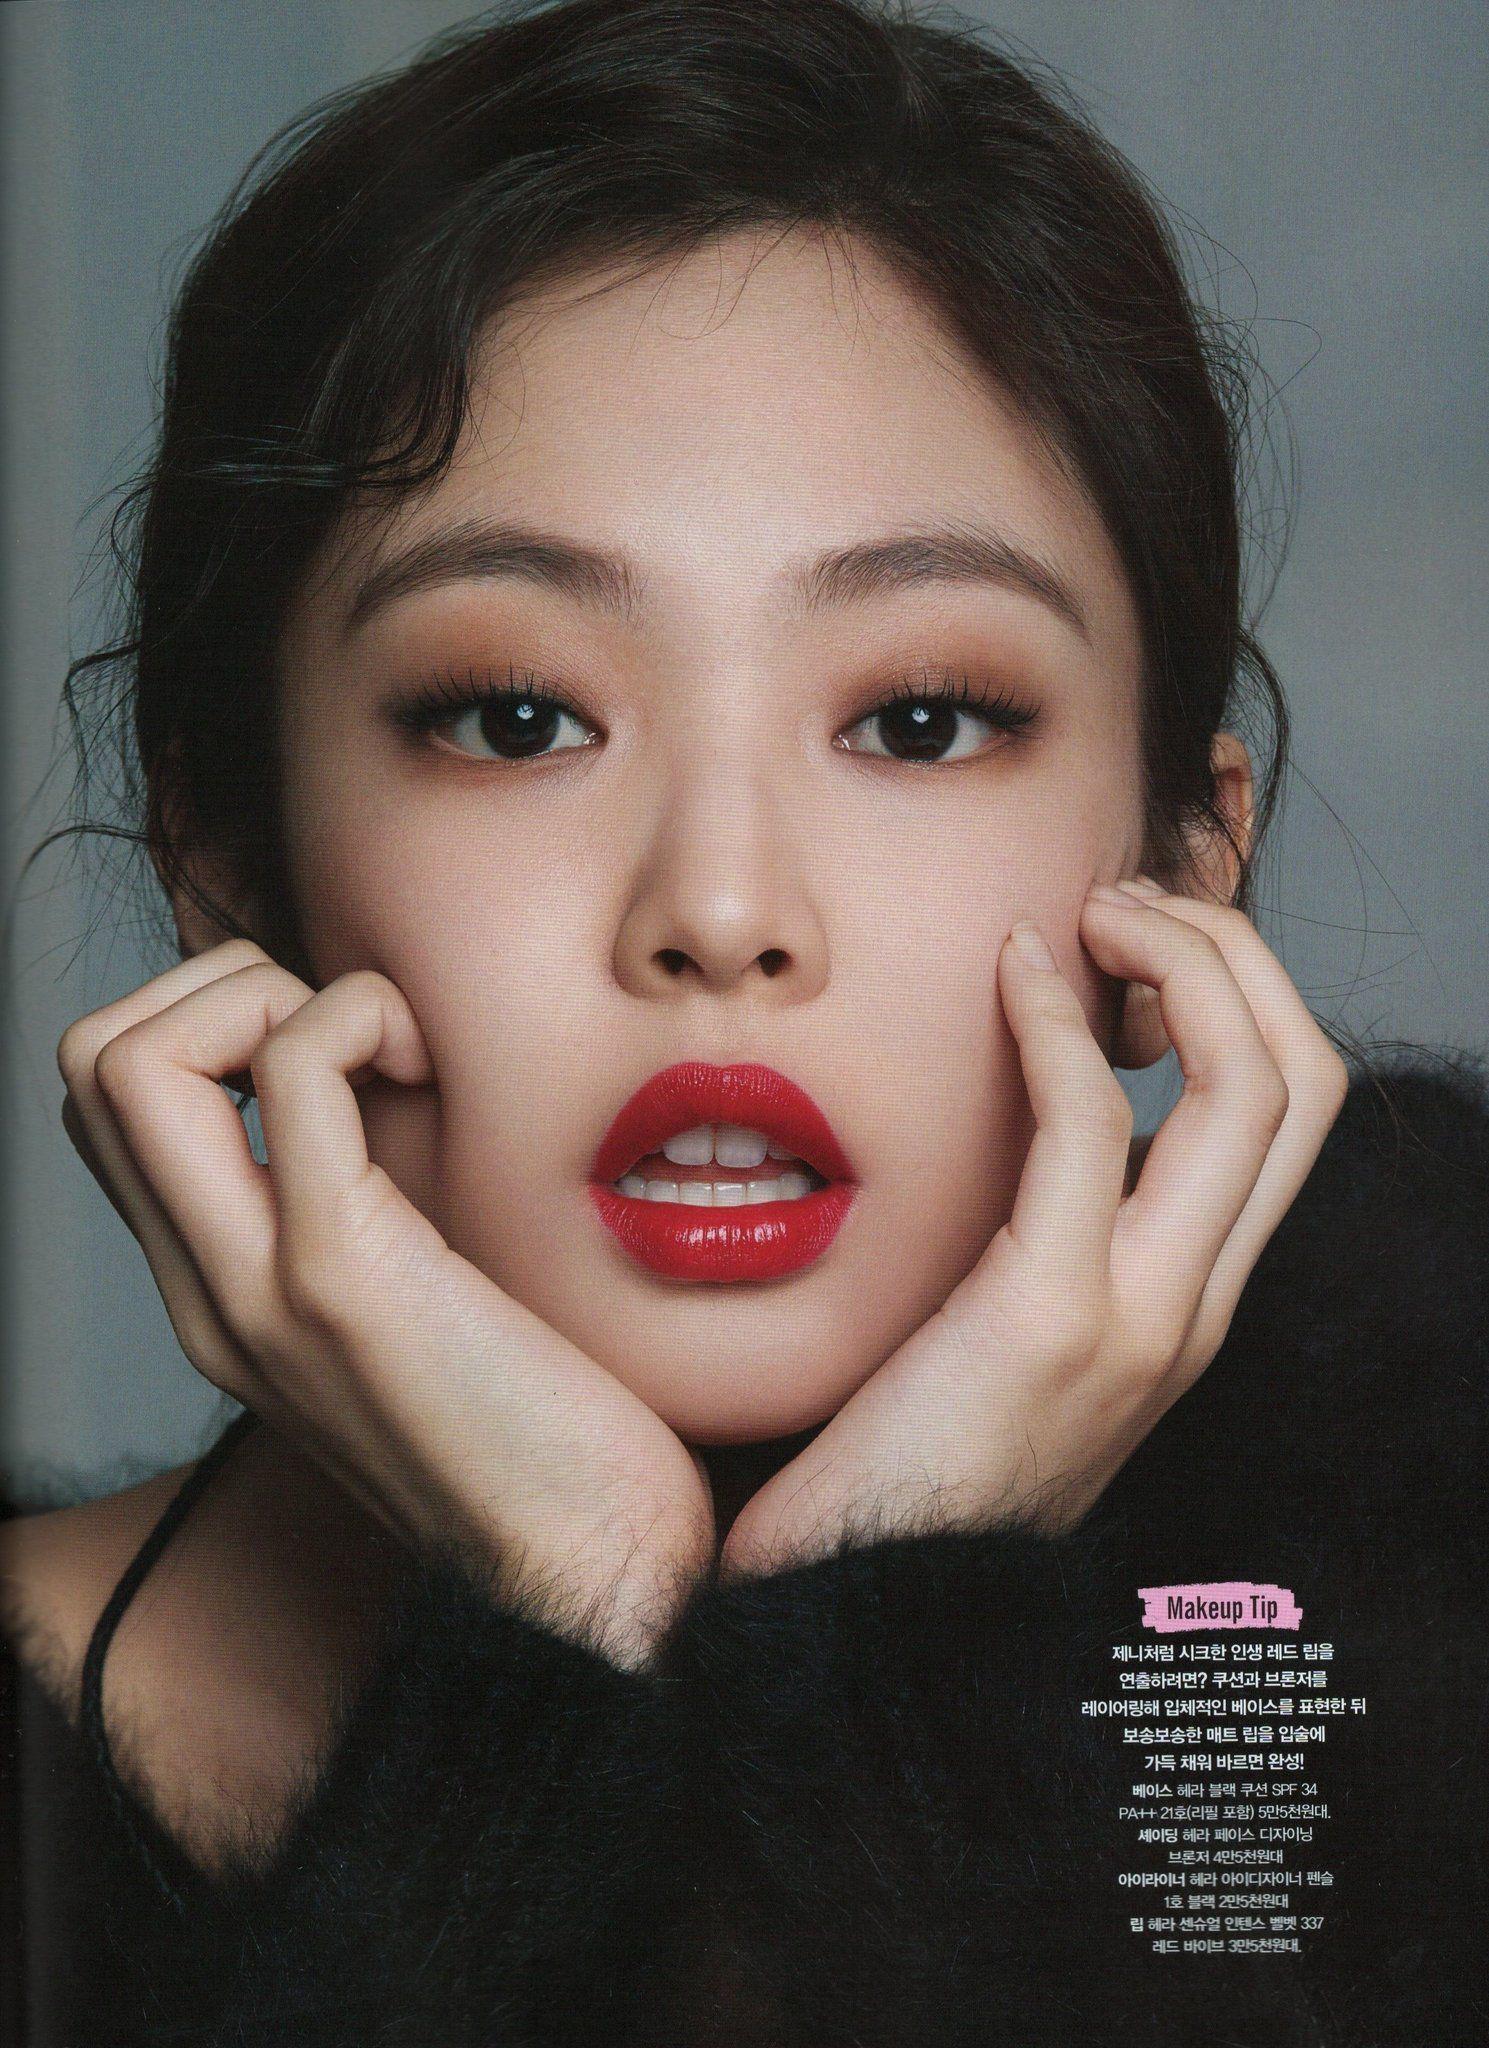 ︎「kimmiecla ︎」 ︎ Blackpink jennie, Kim makeup, Blackpink